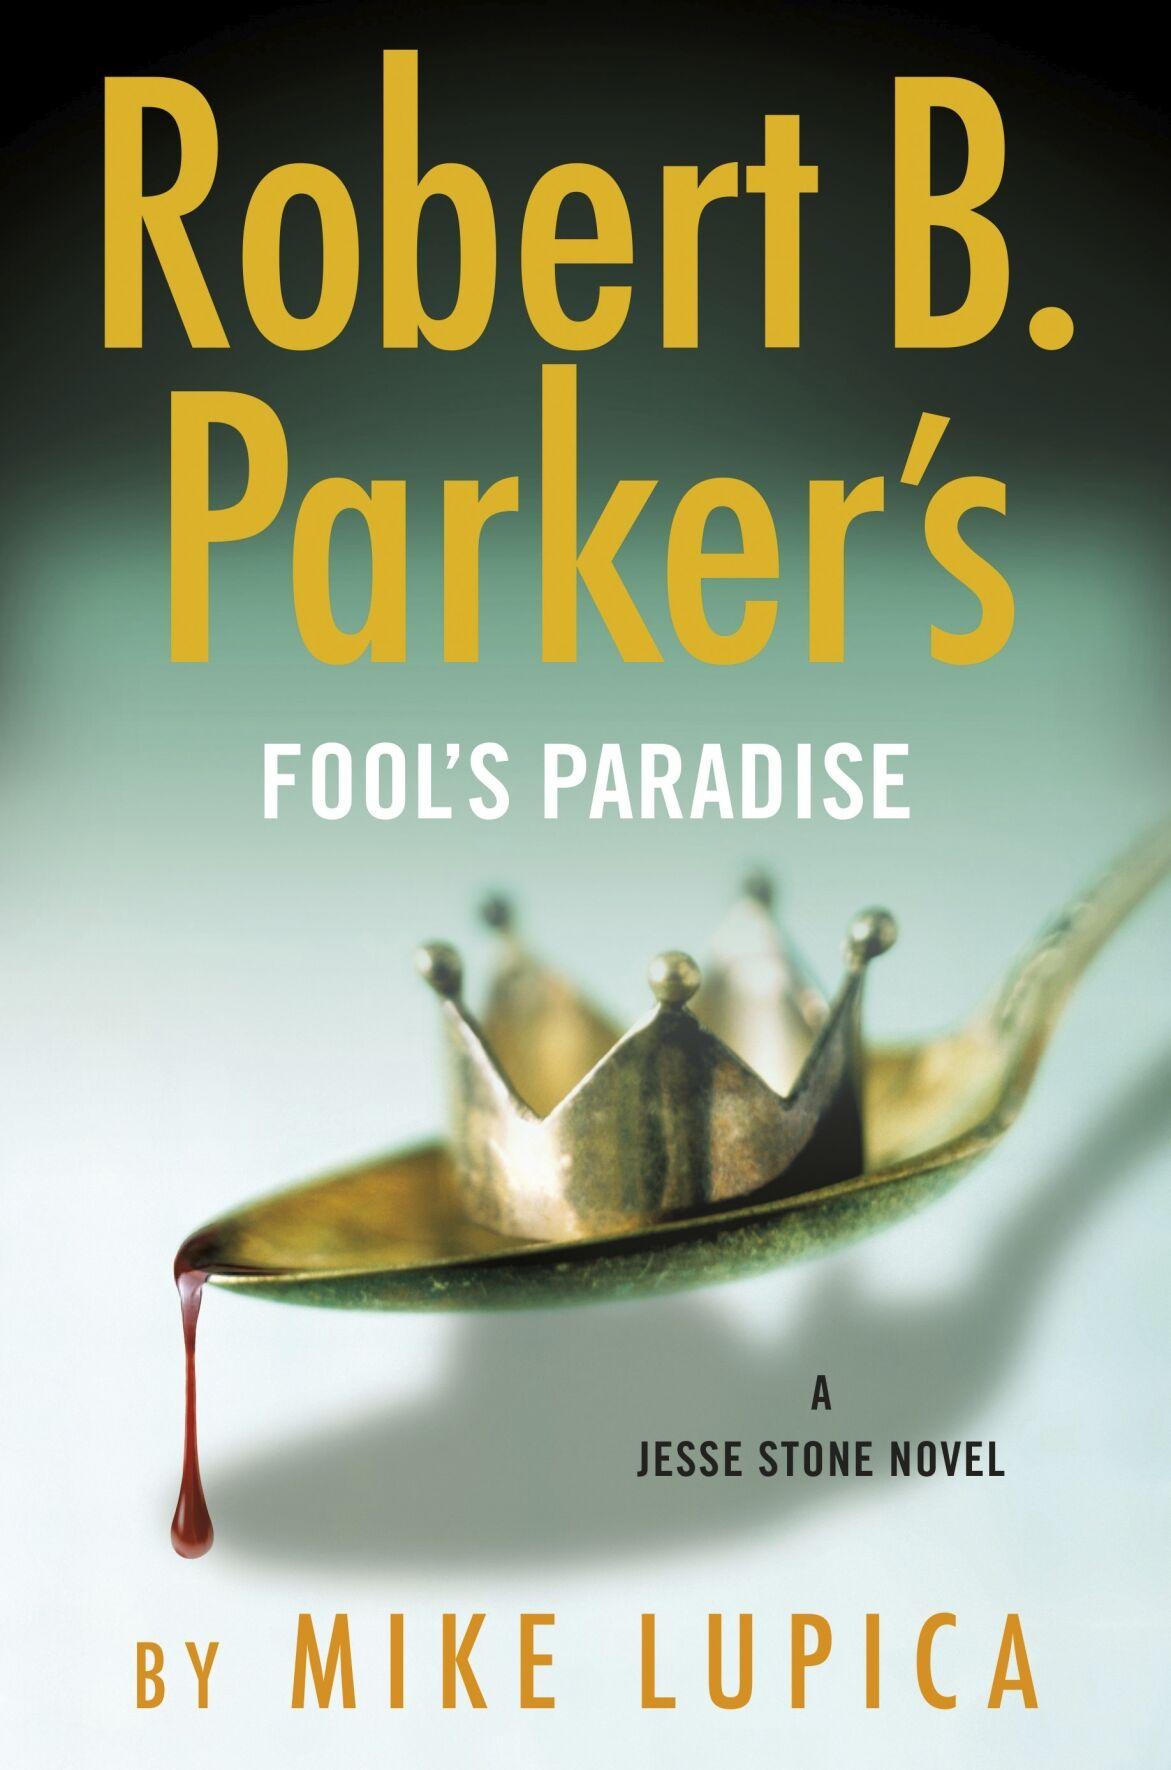 """Robert B. Parker's Fool's Paradise"""